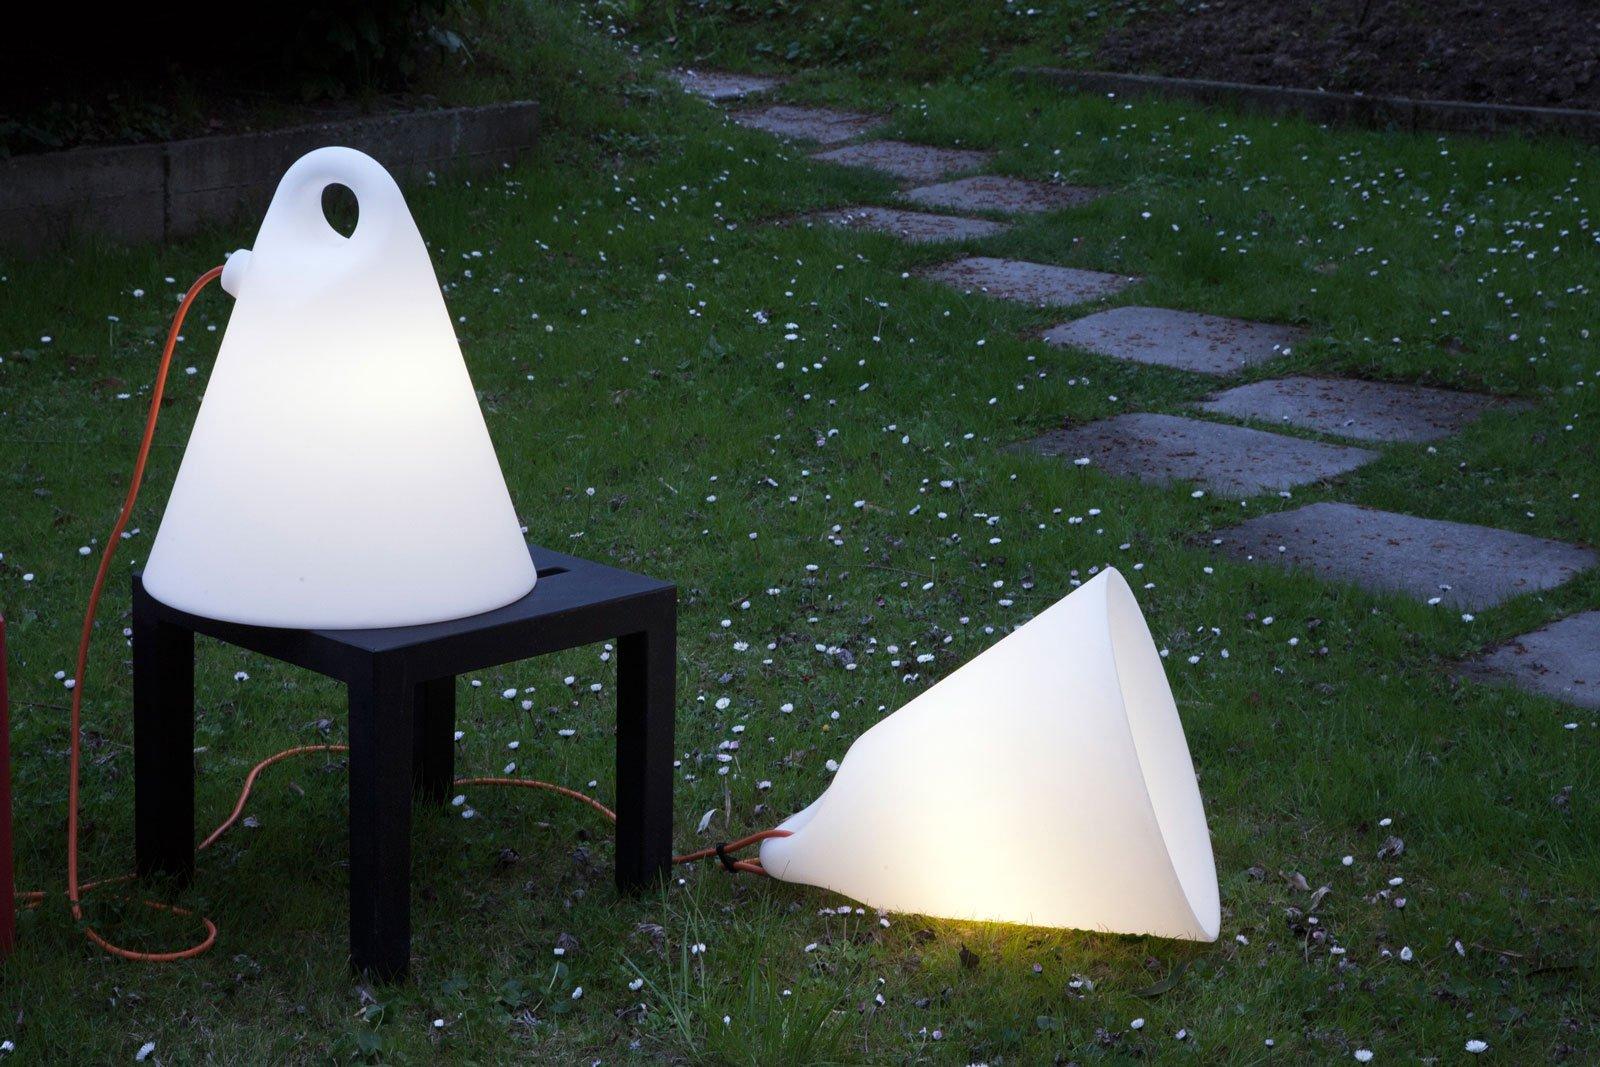 Luce per esterno senza corrente lampade senza corrente lucy la